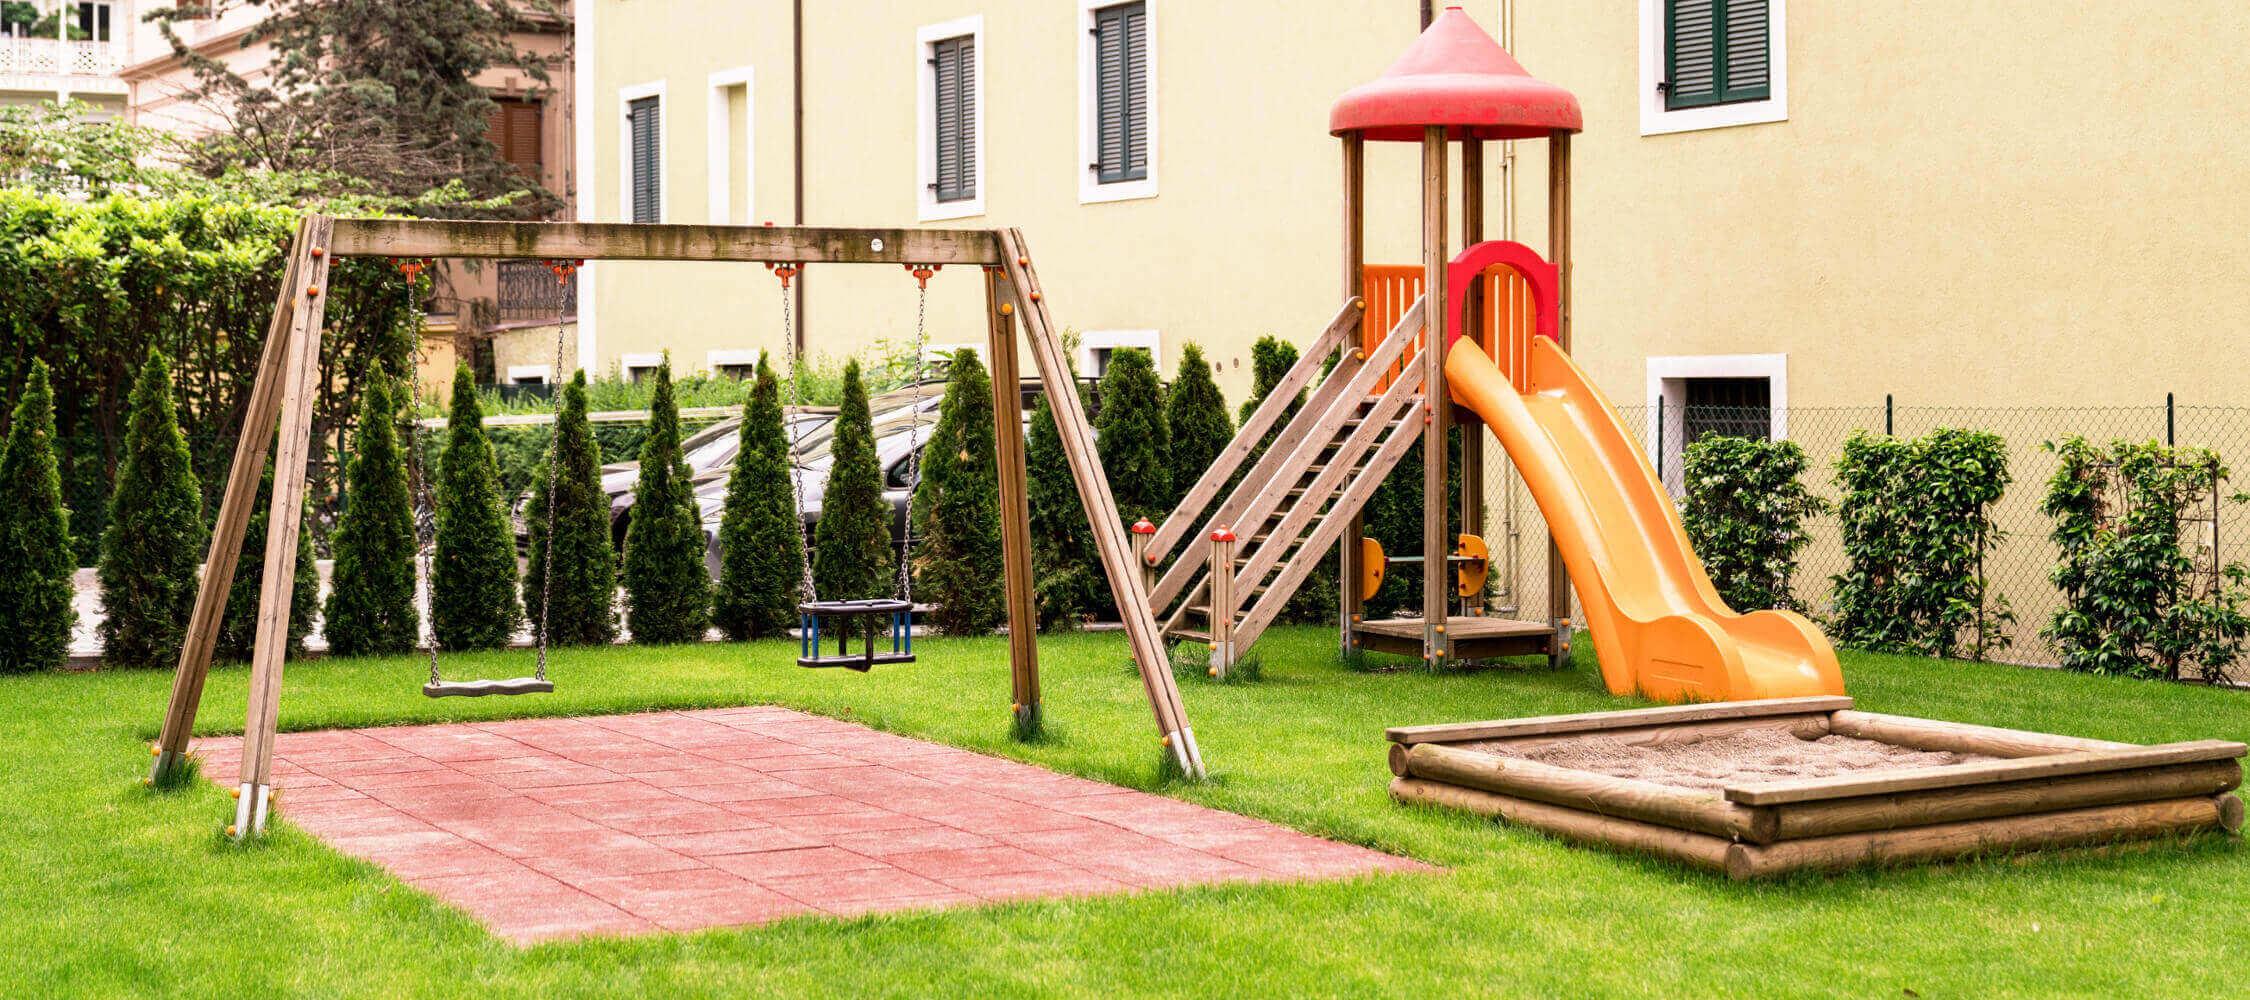 Hotel_Flora_Merano_Family_Kinder_Kinderspielplatz_BeatricePilotto_DSC03543_2250x1000